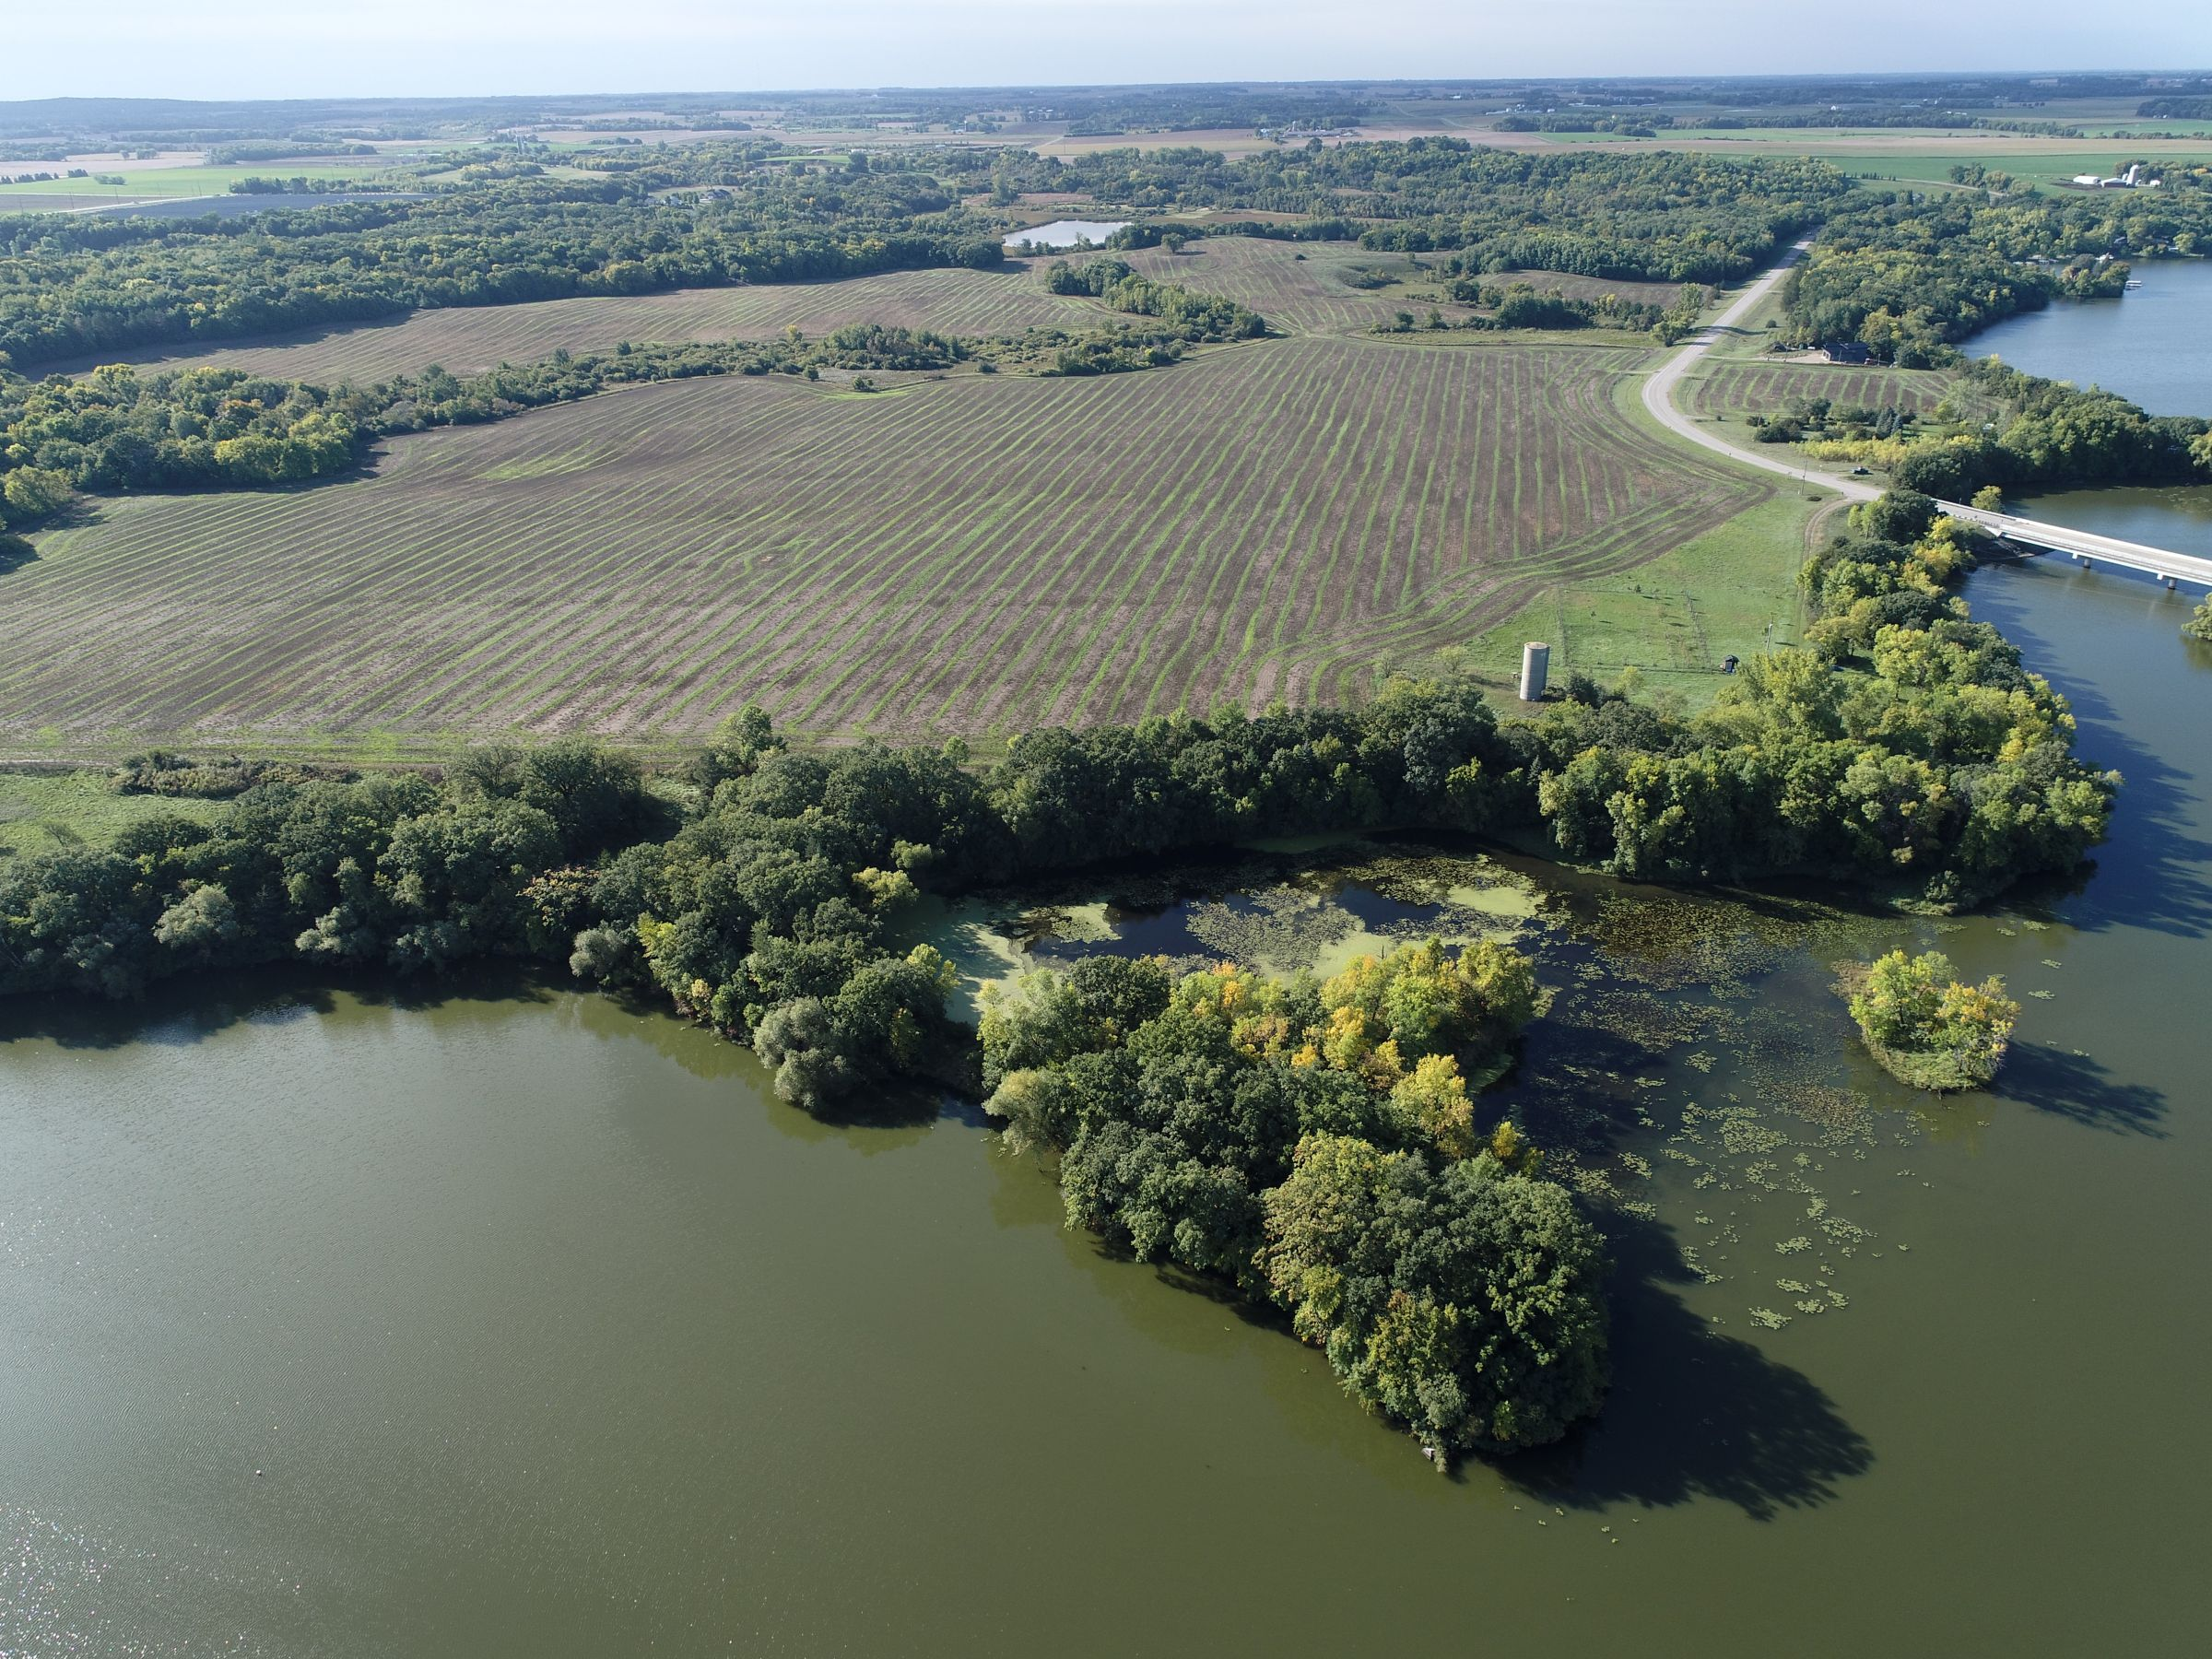 land-stearns-county-minnesota-298-acres-listing-number-15712-0-2021-09-23-124323.JPG